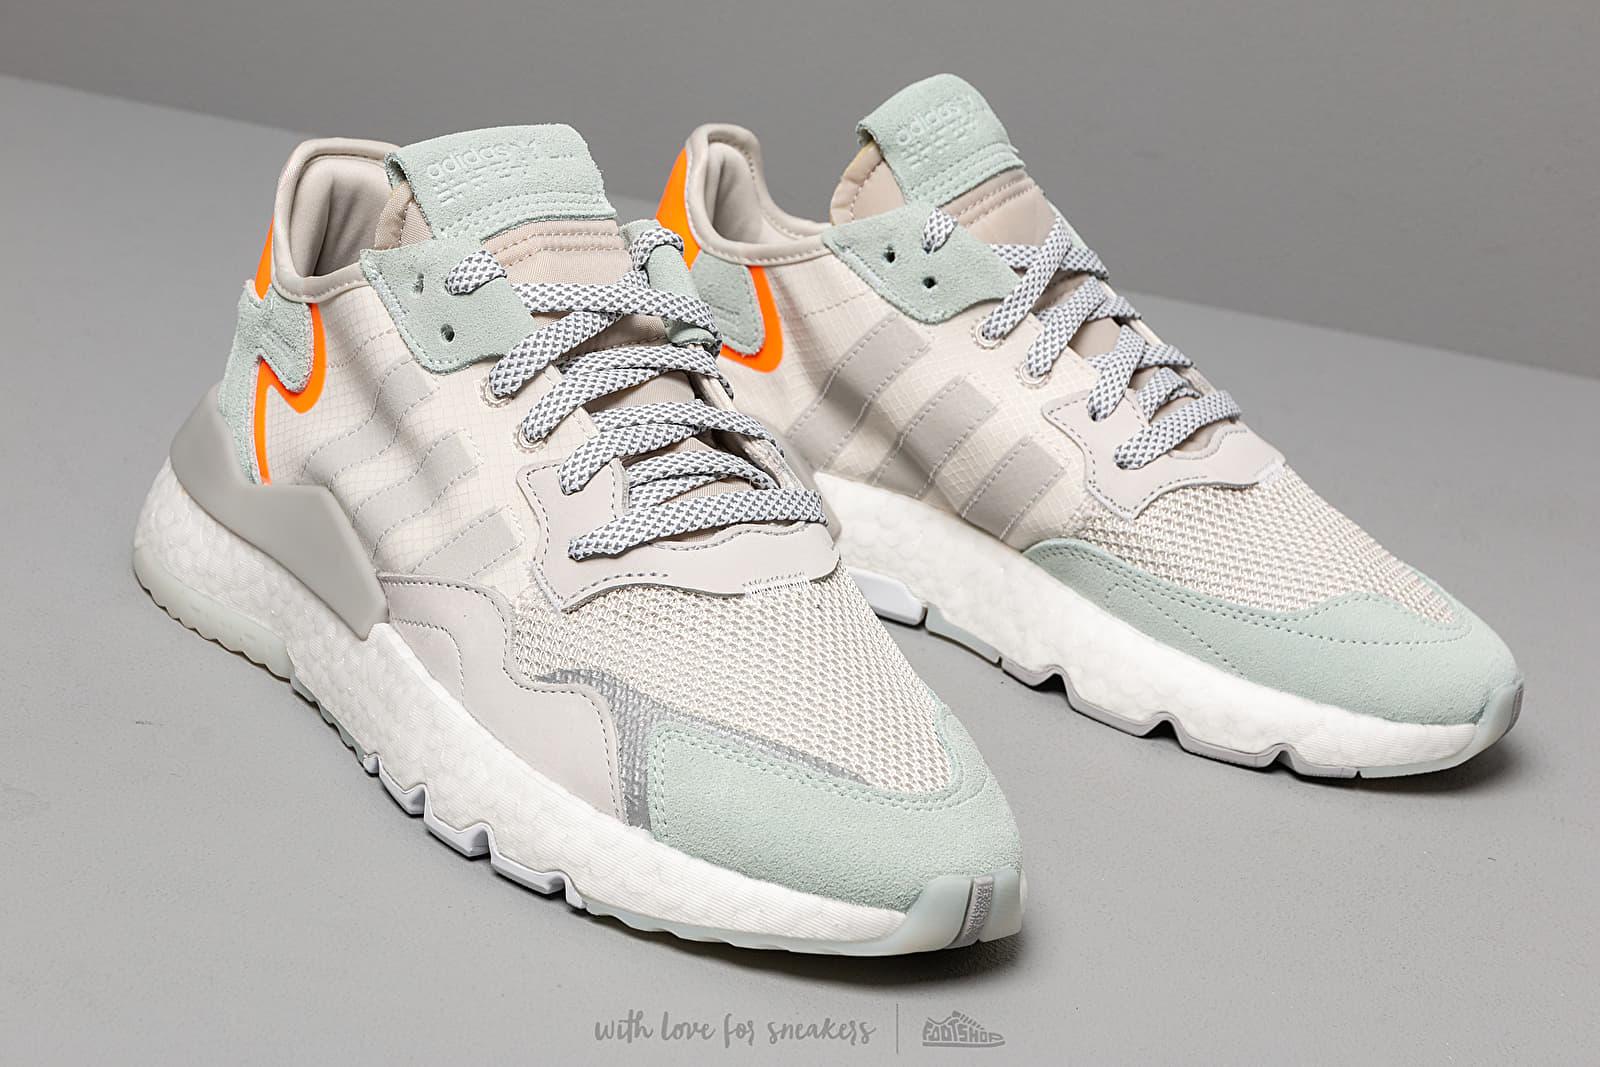 adidas Nite Jogger Raw White/ Grey One/ Vapor Green | Footshop